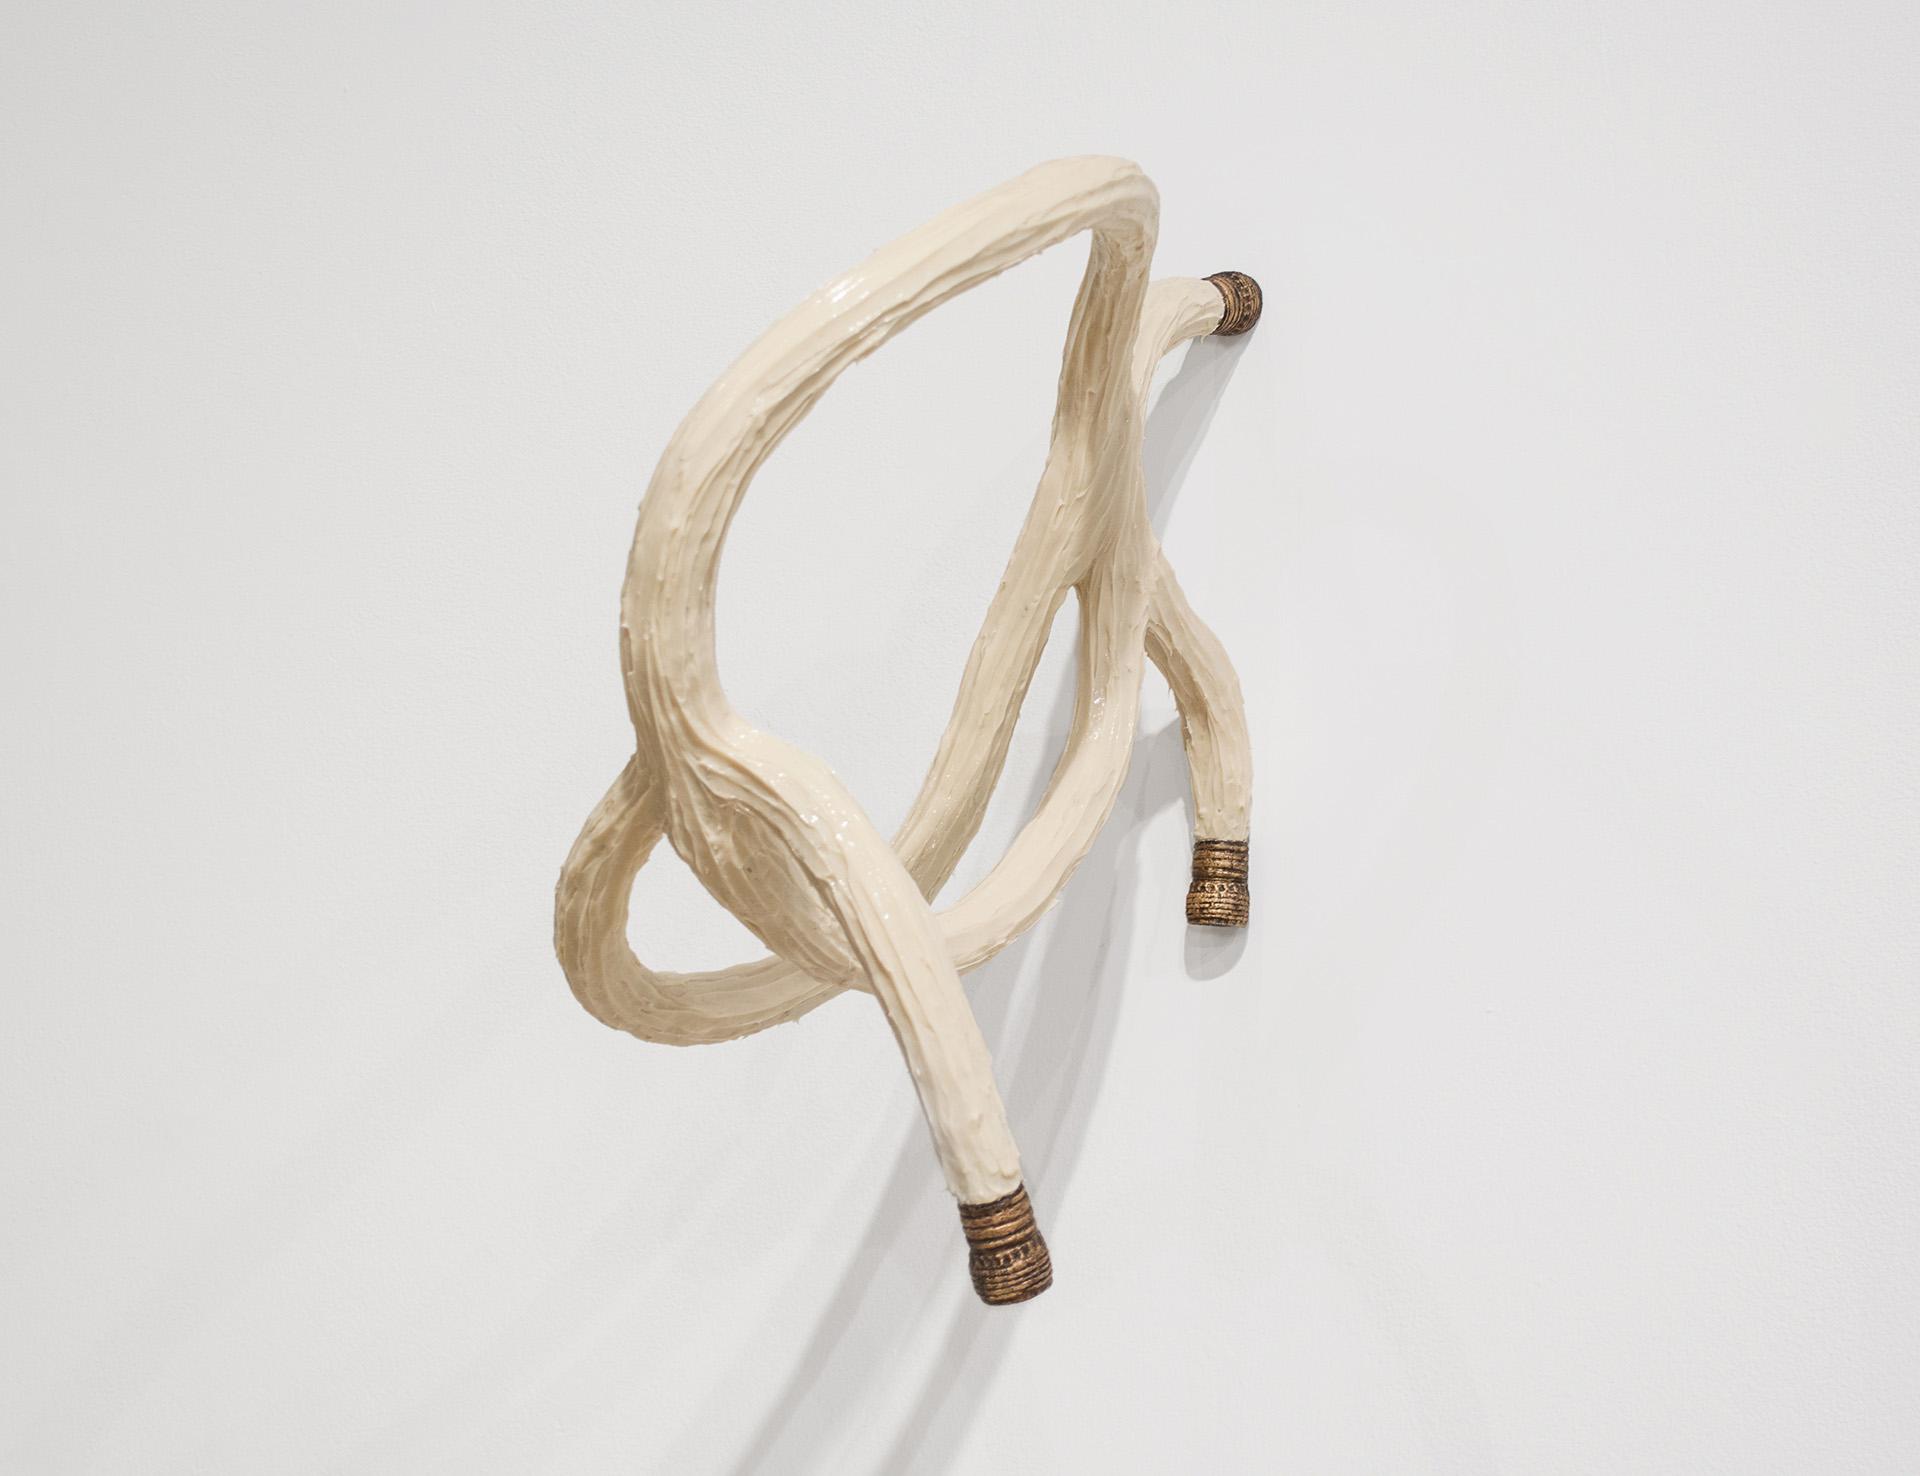 "Water hose, Knot   2015 20"" x 11"" x 19.5"" Rope, rubber, aluminum, plastic, pigment, oil-based paint"